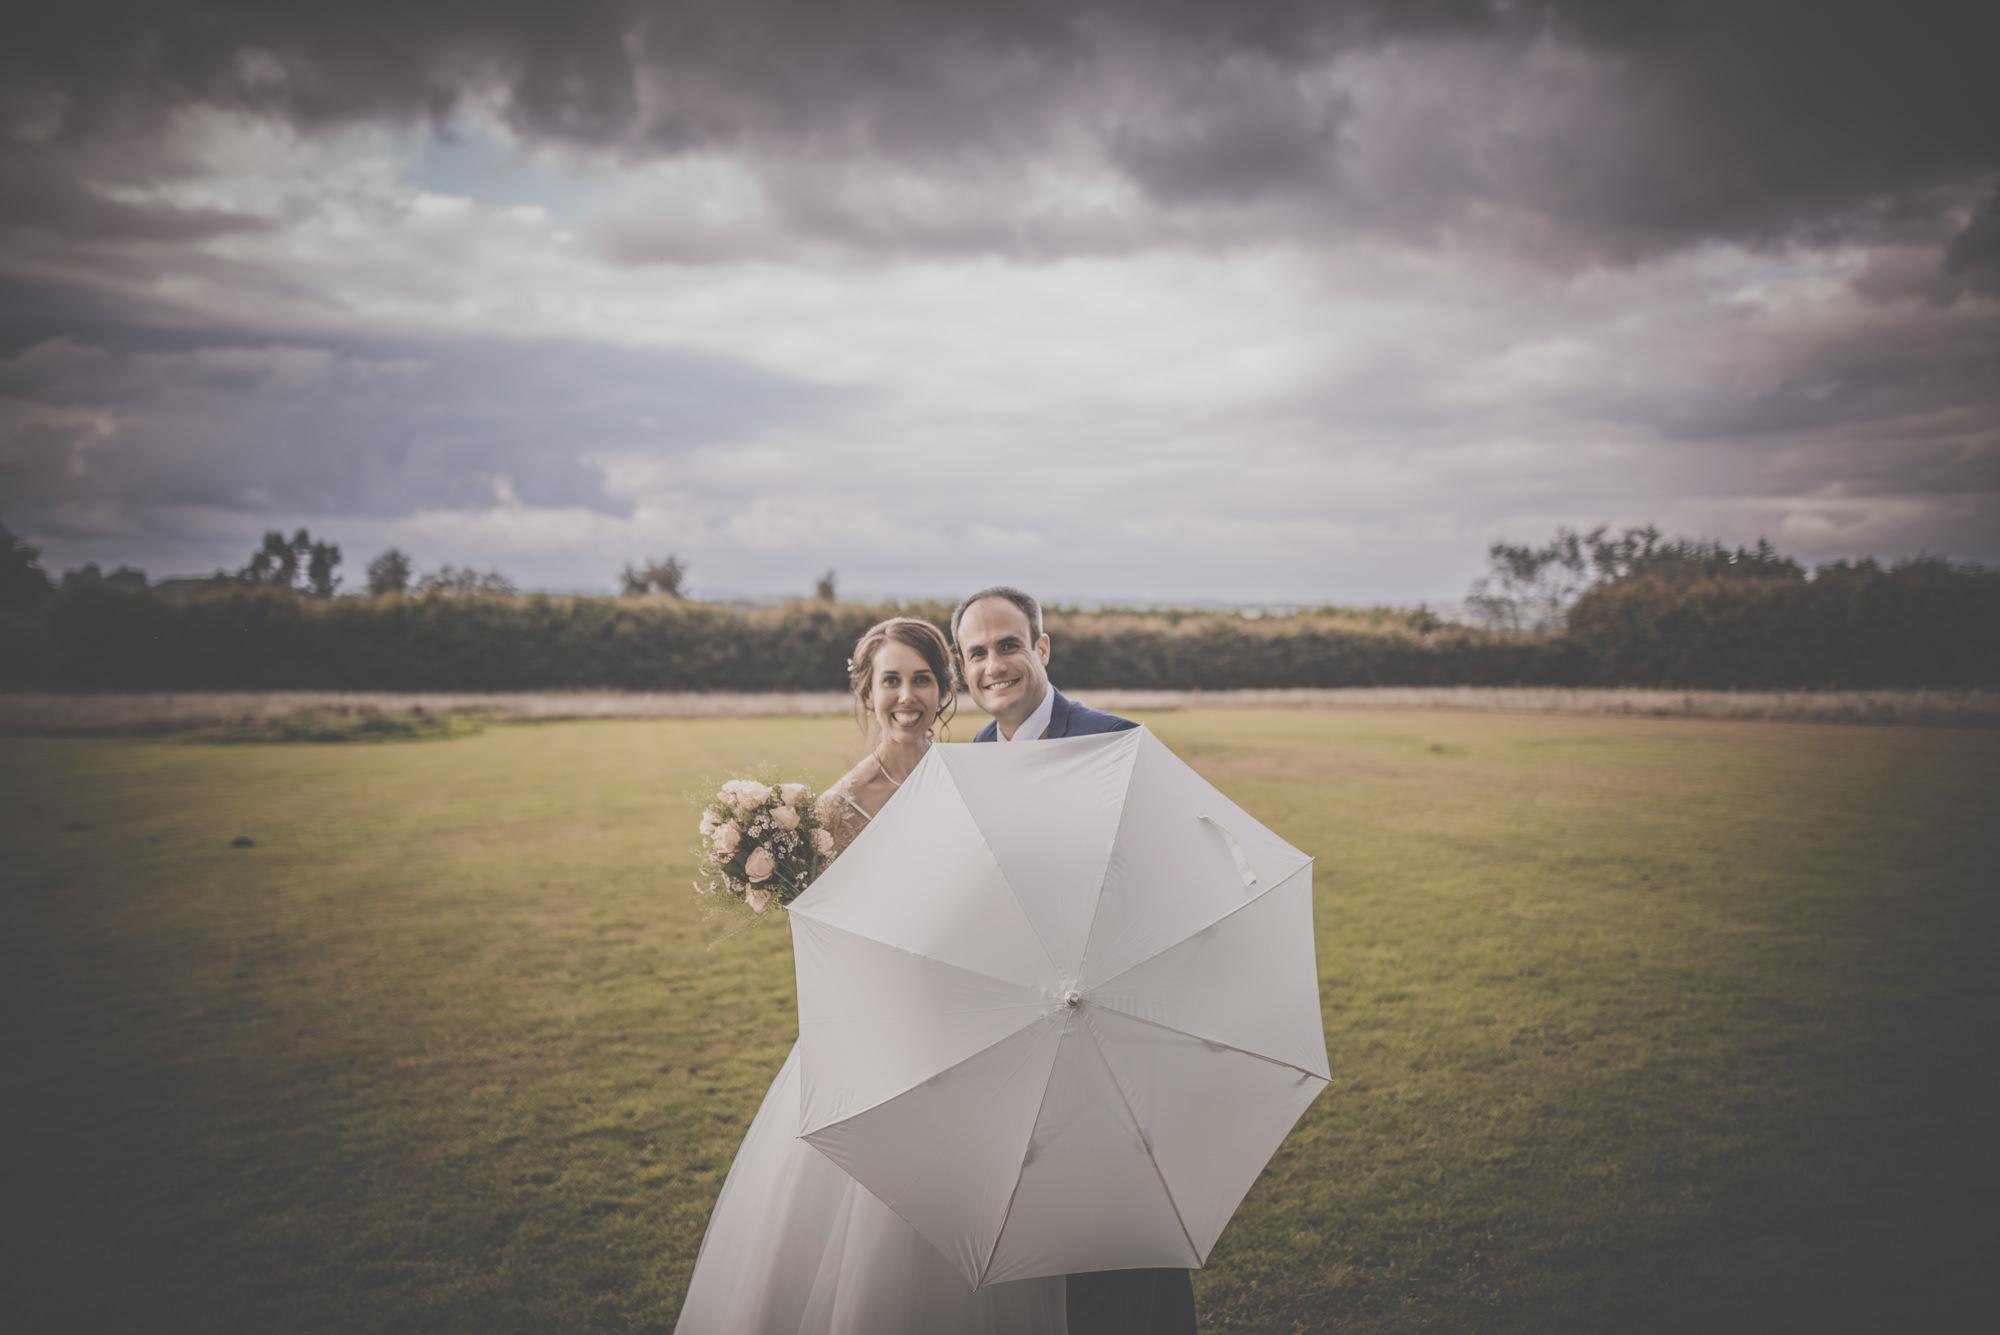 Charisse-and-James-wedding-in-Cain-Manor-Venue-Hampshire-Manu-Mendoza-Wedding-Photography-375.jpg